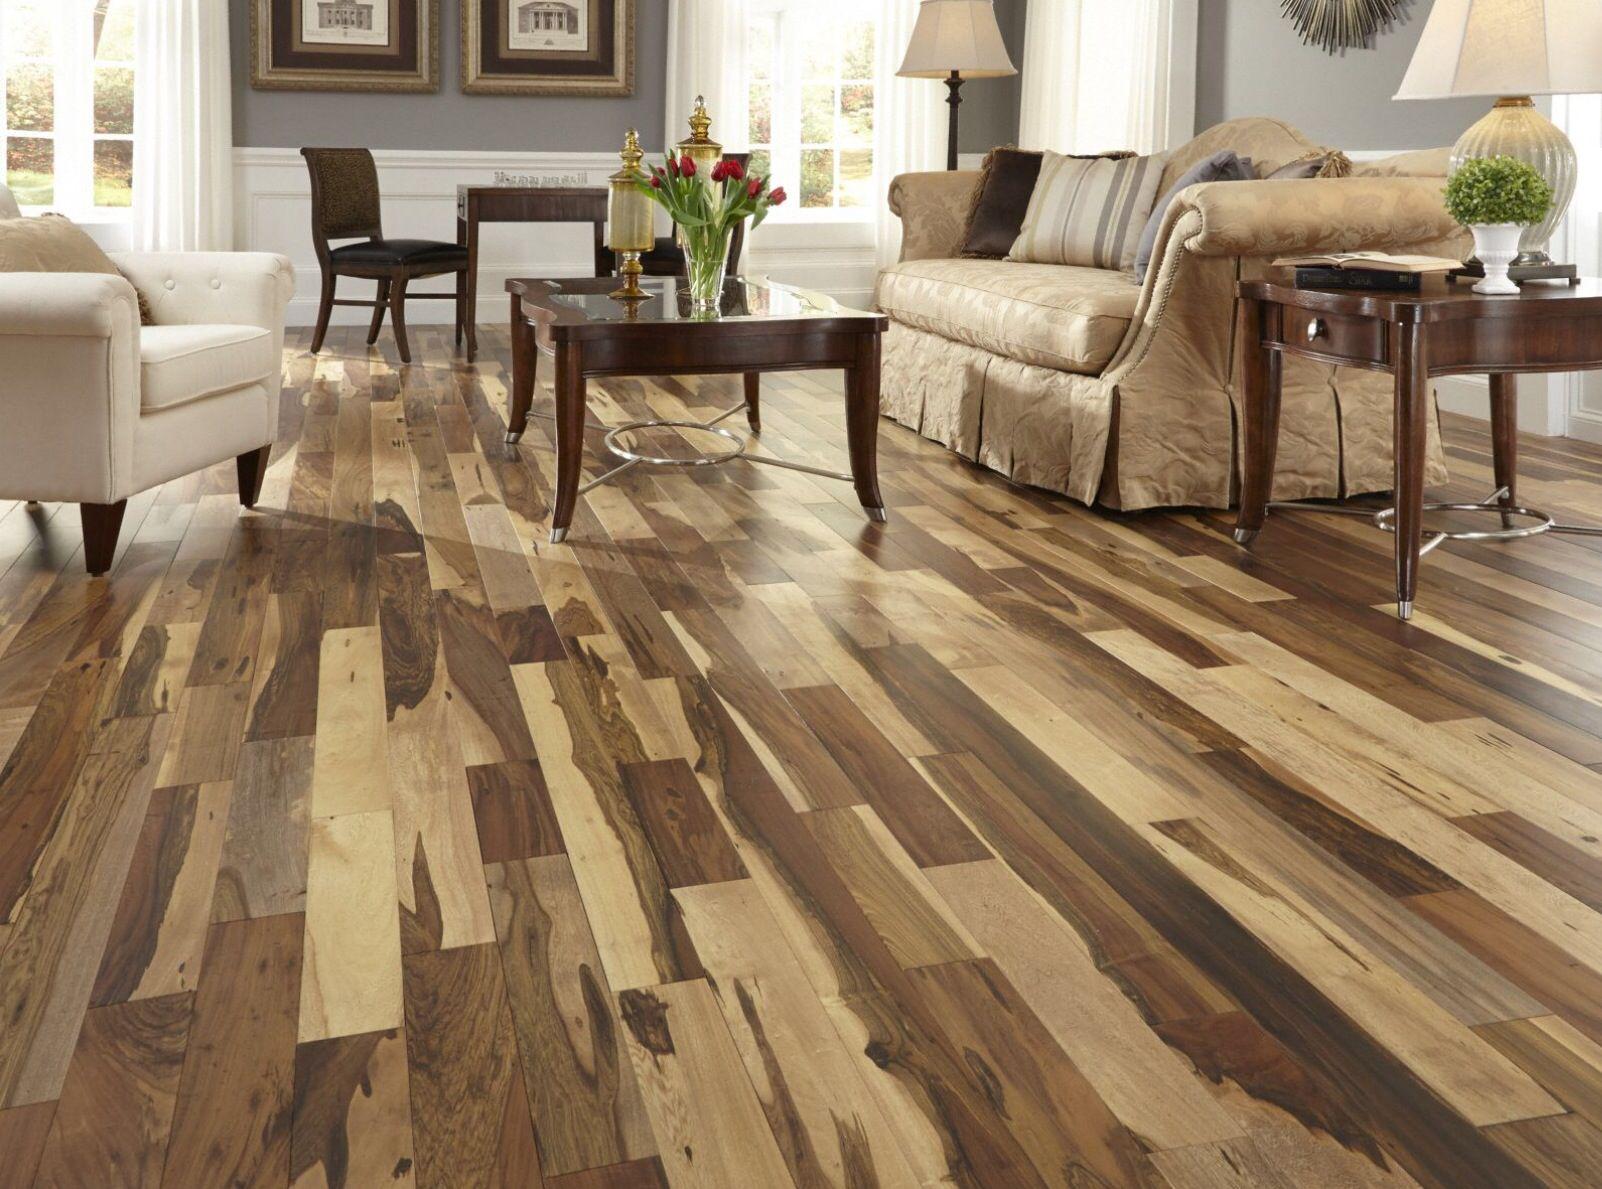 Brazilian pecan hardwood flooring. Absolutely beautiful